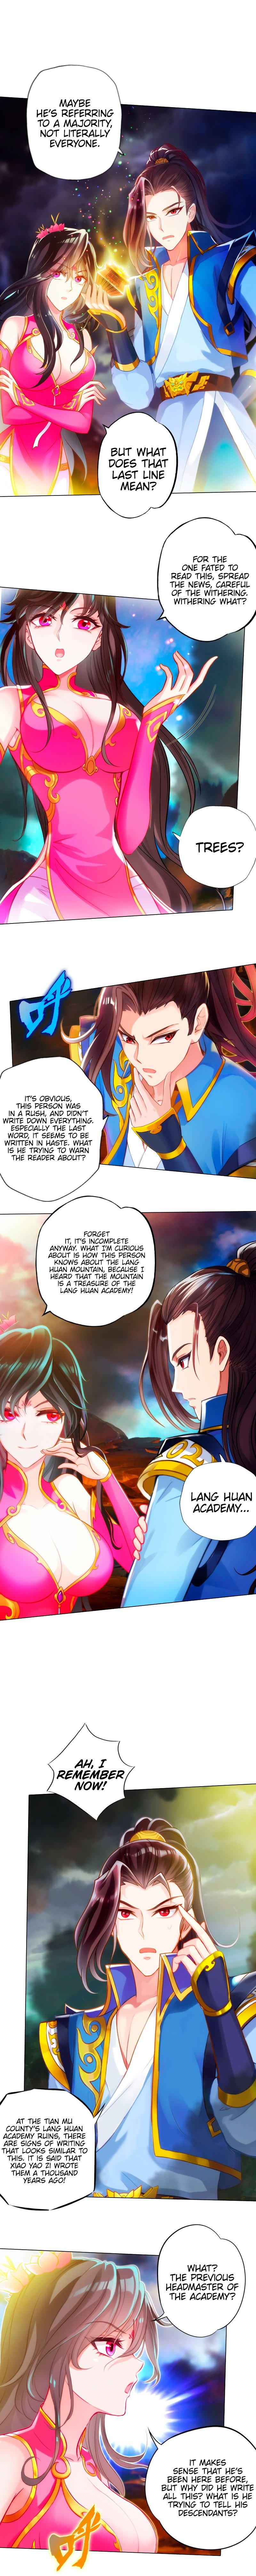 Manga Lang Huan Library - Chapter 80 Page 9